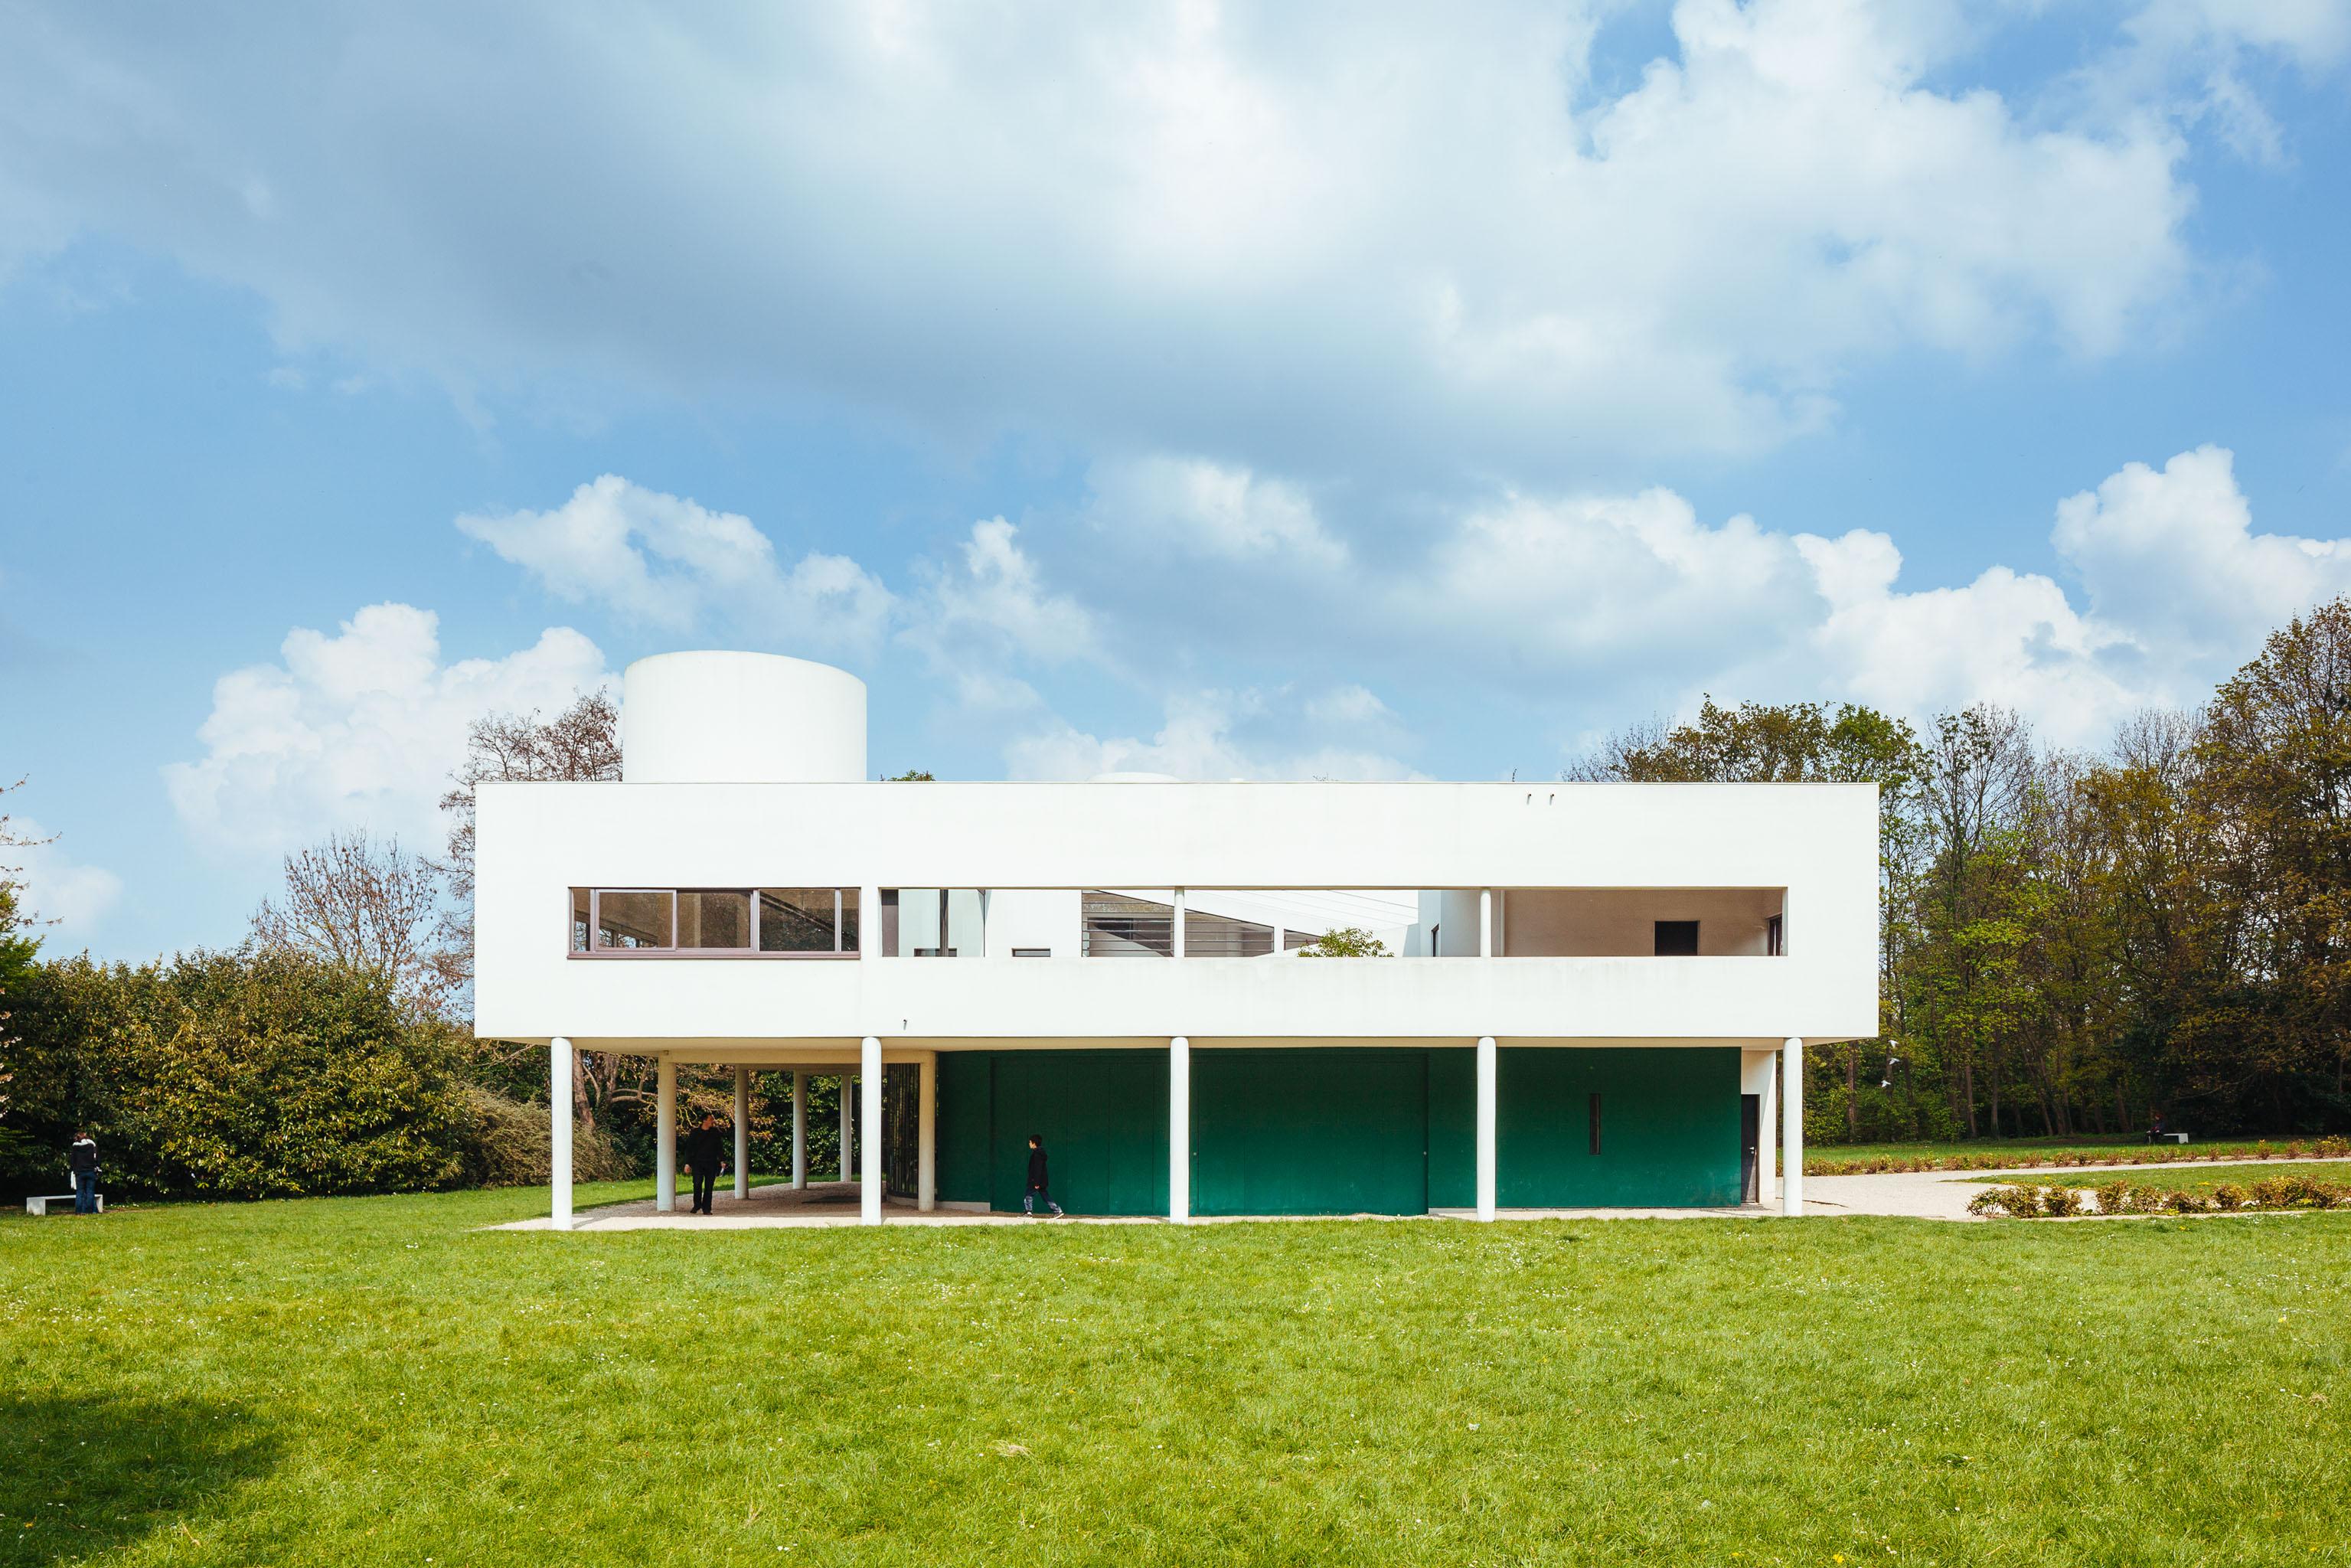 villa savoye in poissy france pedro kok. Black Bedroom Furniture Sets. Home Design Ideas